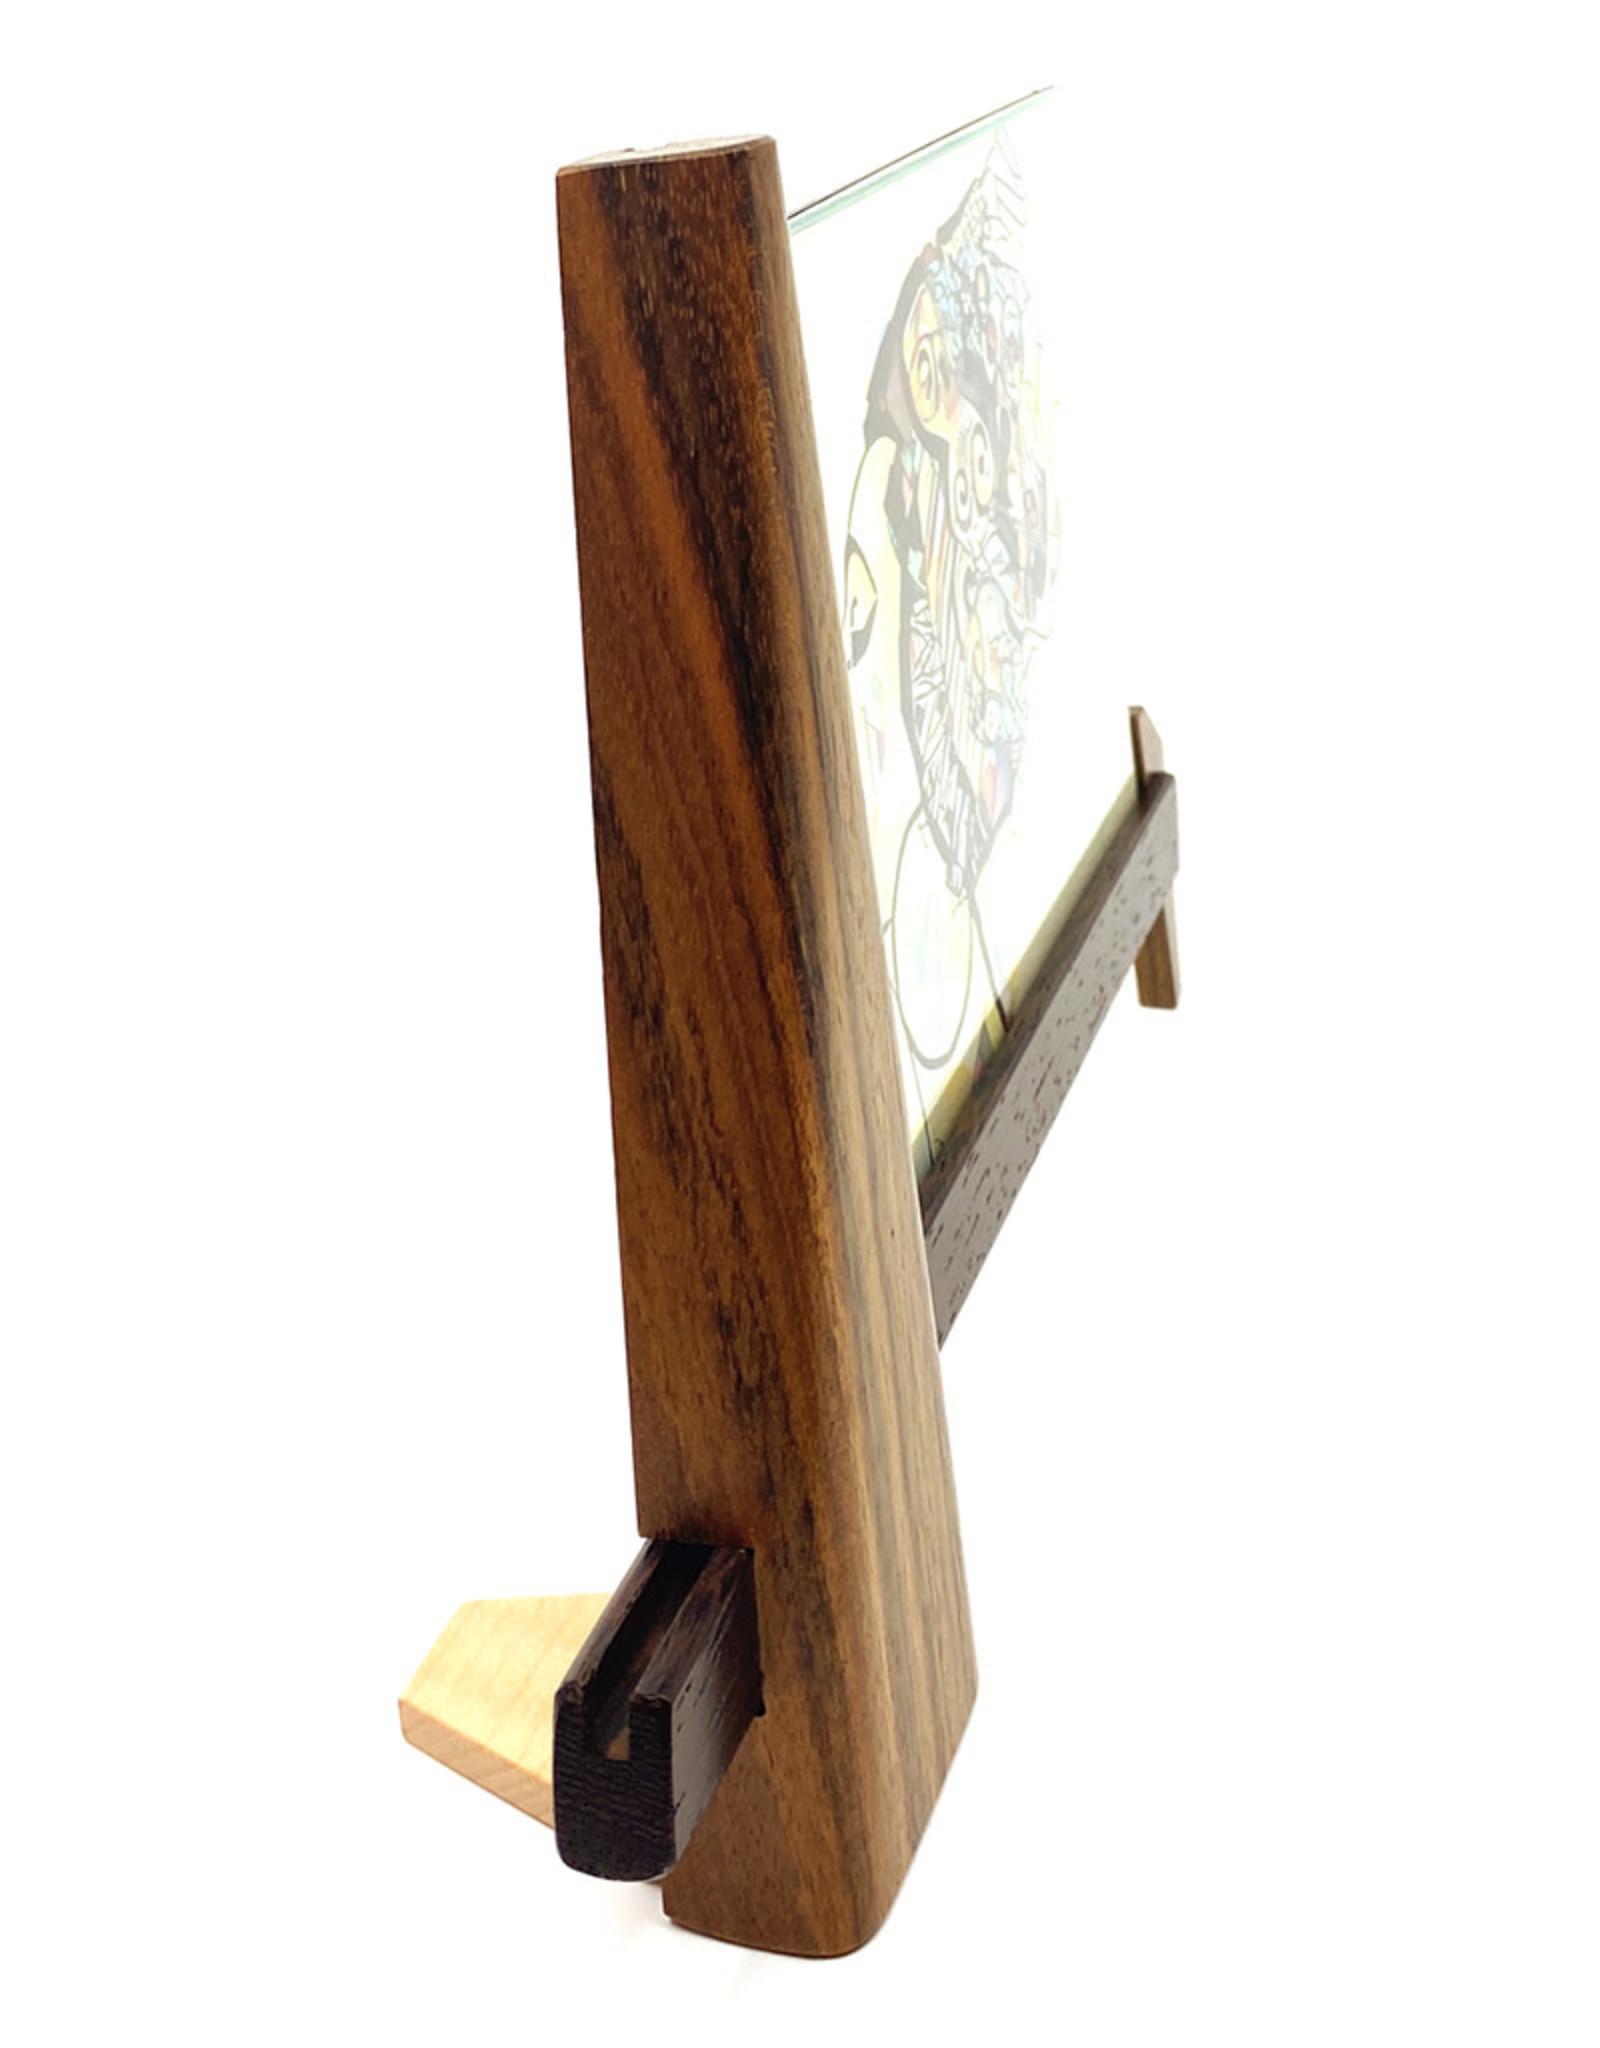 MIKUTOWSKI WOODWORKING HORIZONTAL SHEDUA VOYAGE PICTURE FRAME